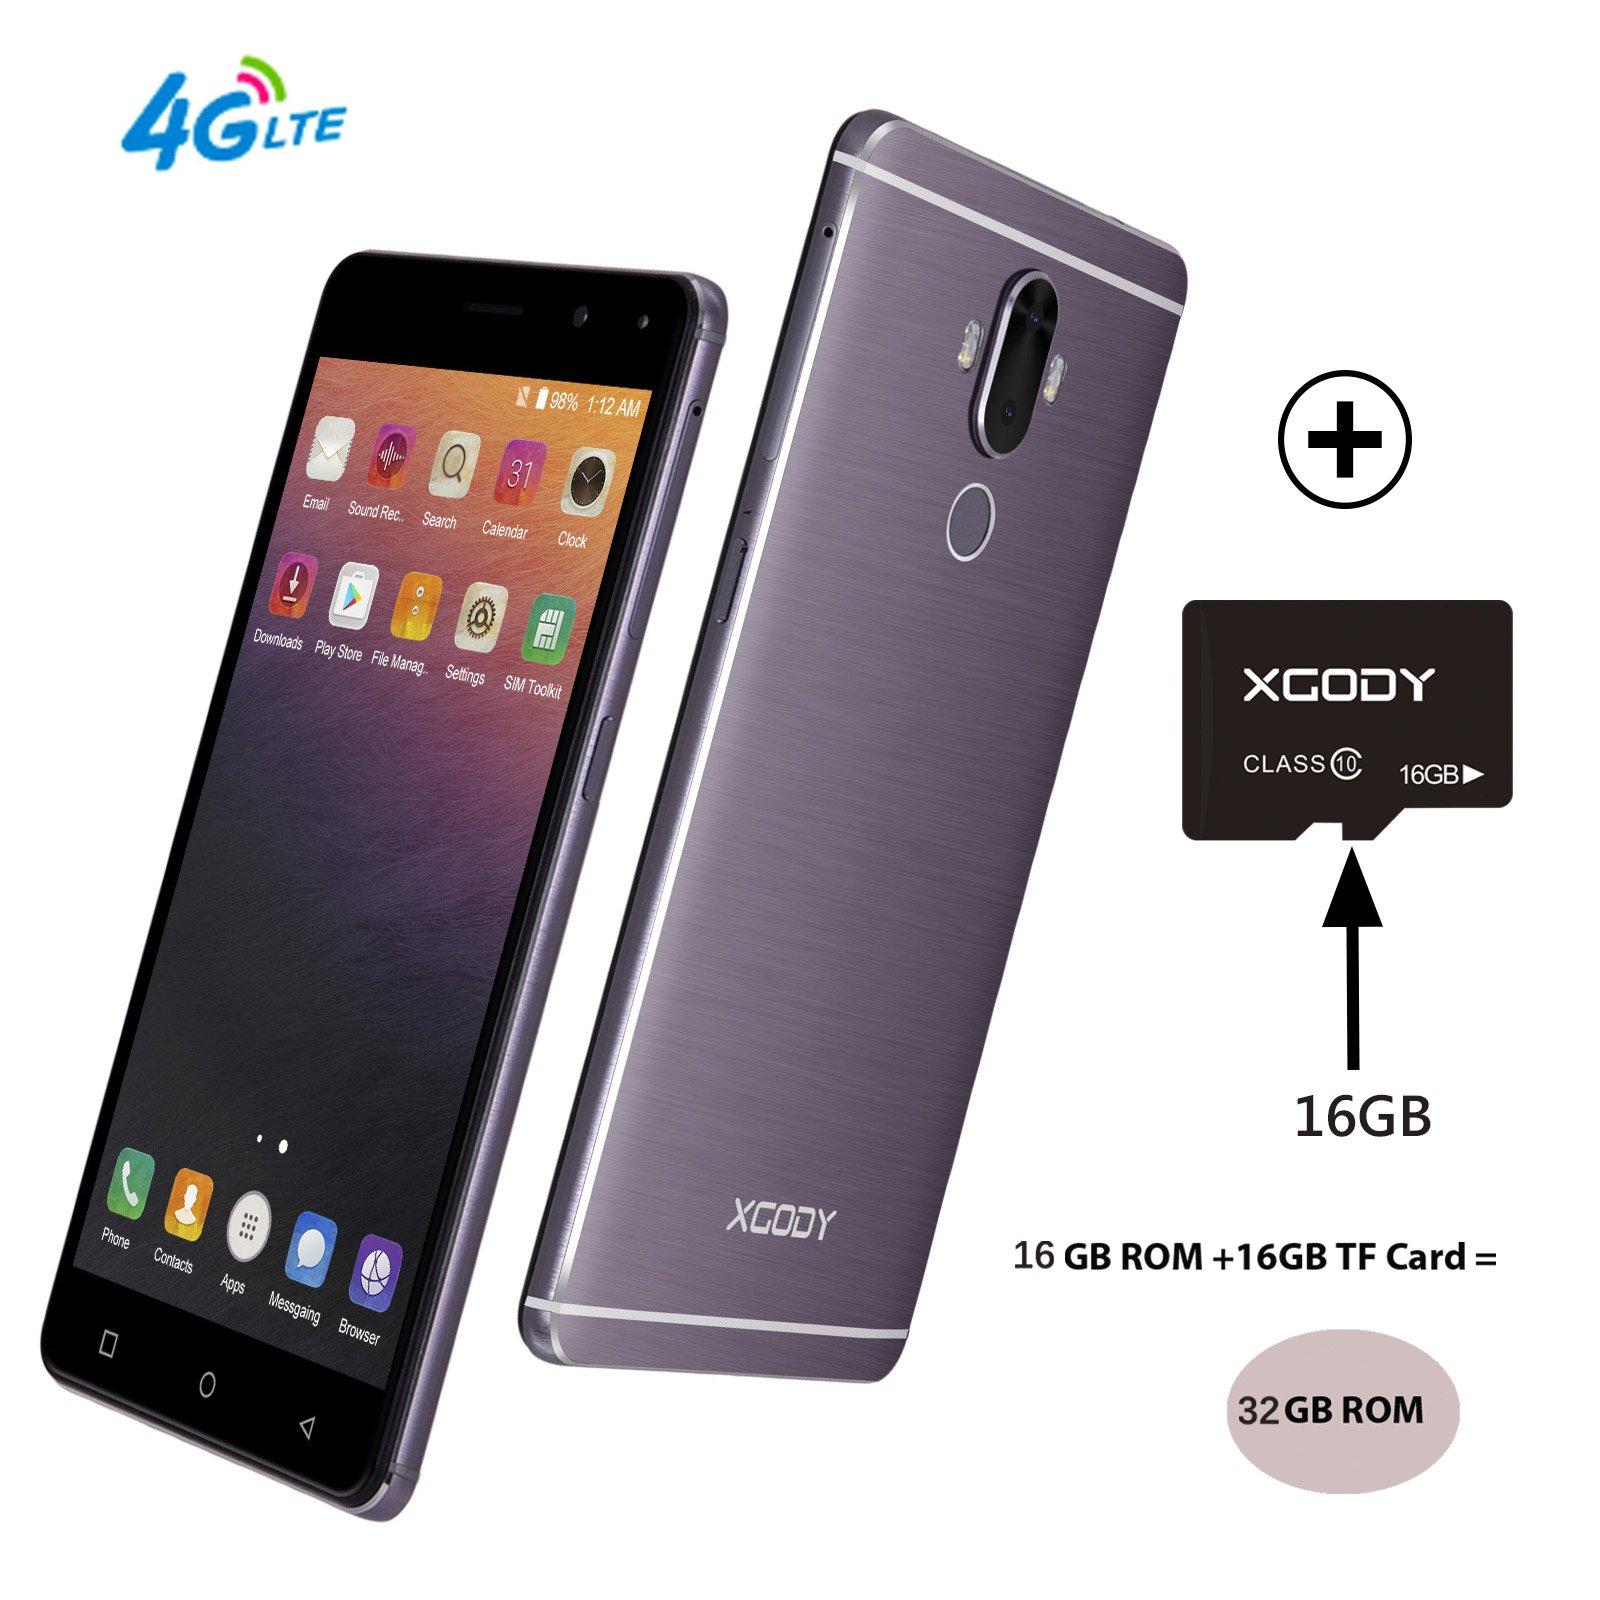 Xgody Y19 Unlocked Smartphones with fingerprint sensor 4G FDD-LTE Android 7.0 6 Inch Dual SIM HD 720x1280 32GB (16GB ROM+16GB SD card) Quad Core Support GPS Wi-Fi Bluetooth Celulares Gray purple